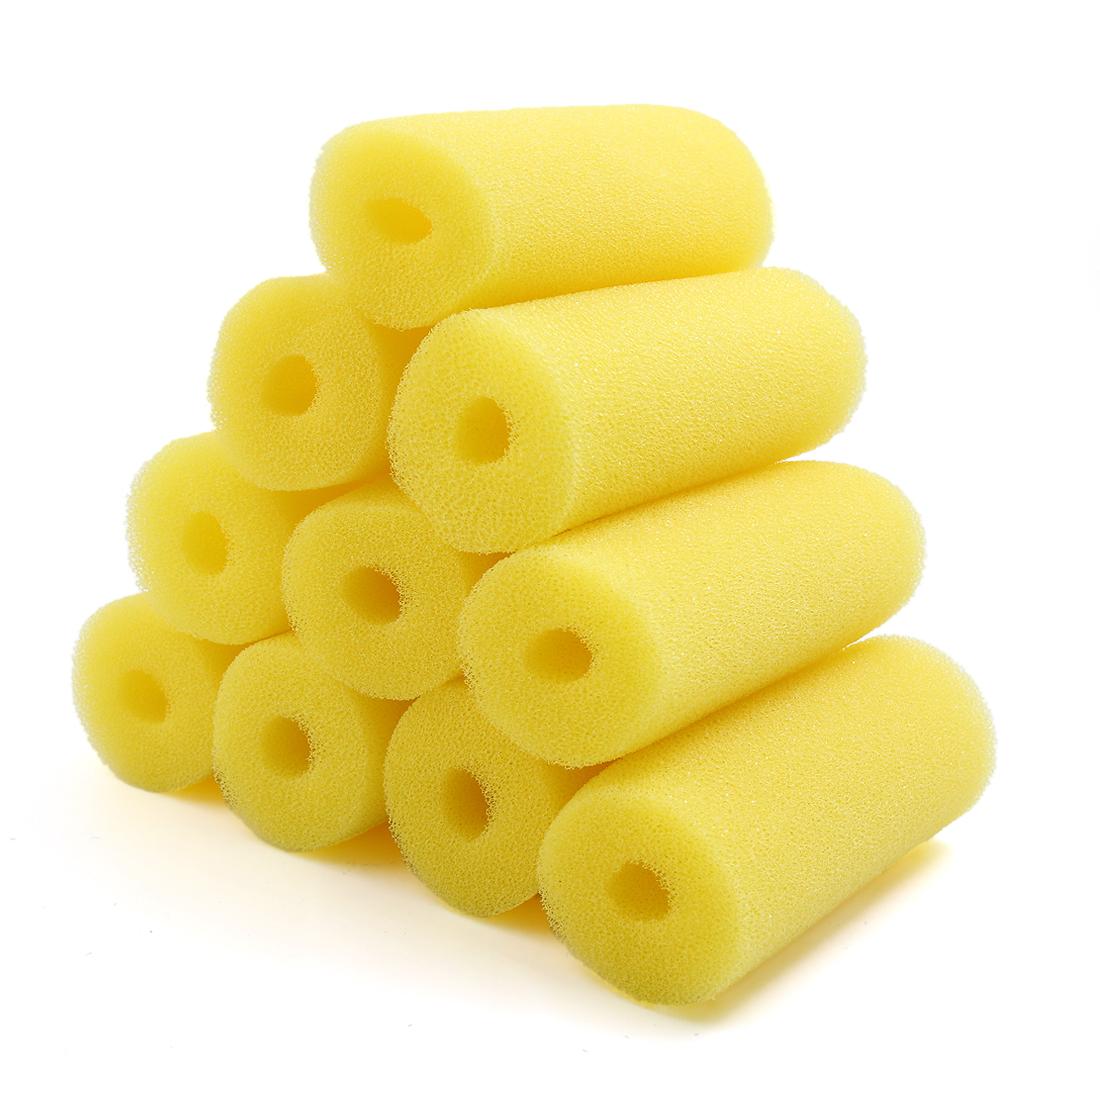 10pcs 2.6inch Dia Cylinder Aquarium Pre-Filter Yellow Sponge Filter Cartridges